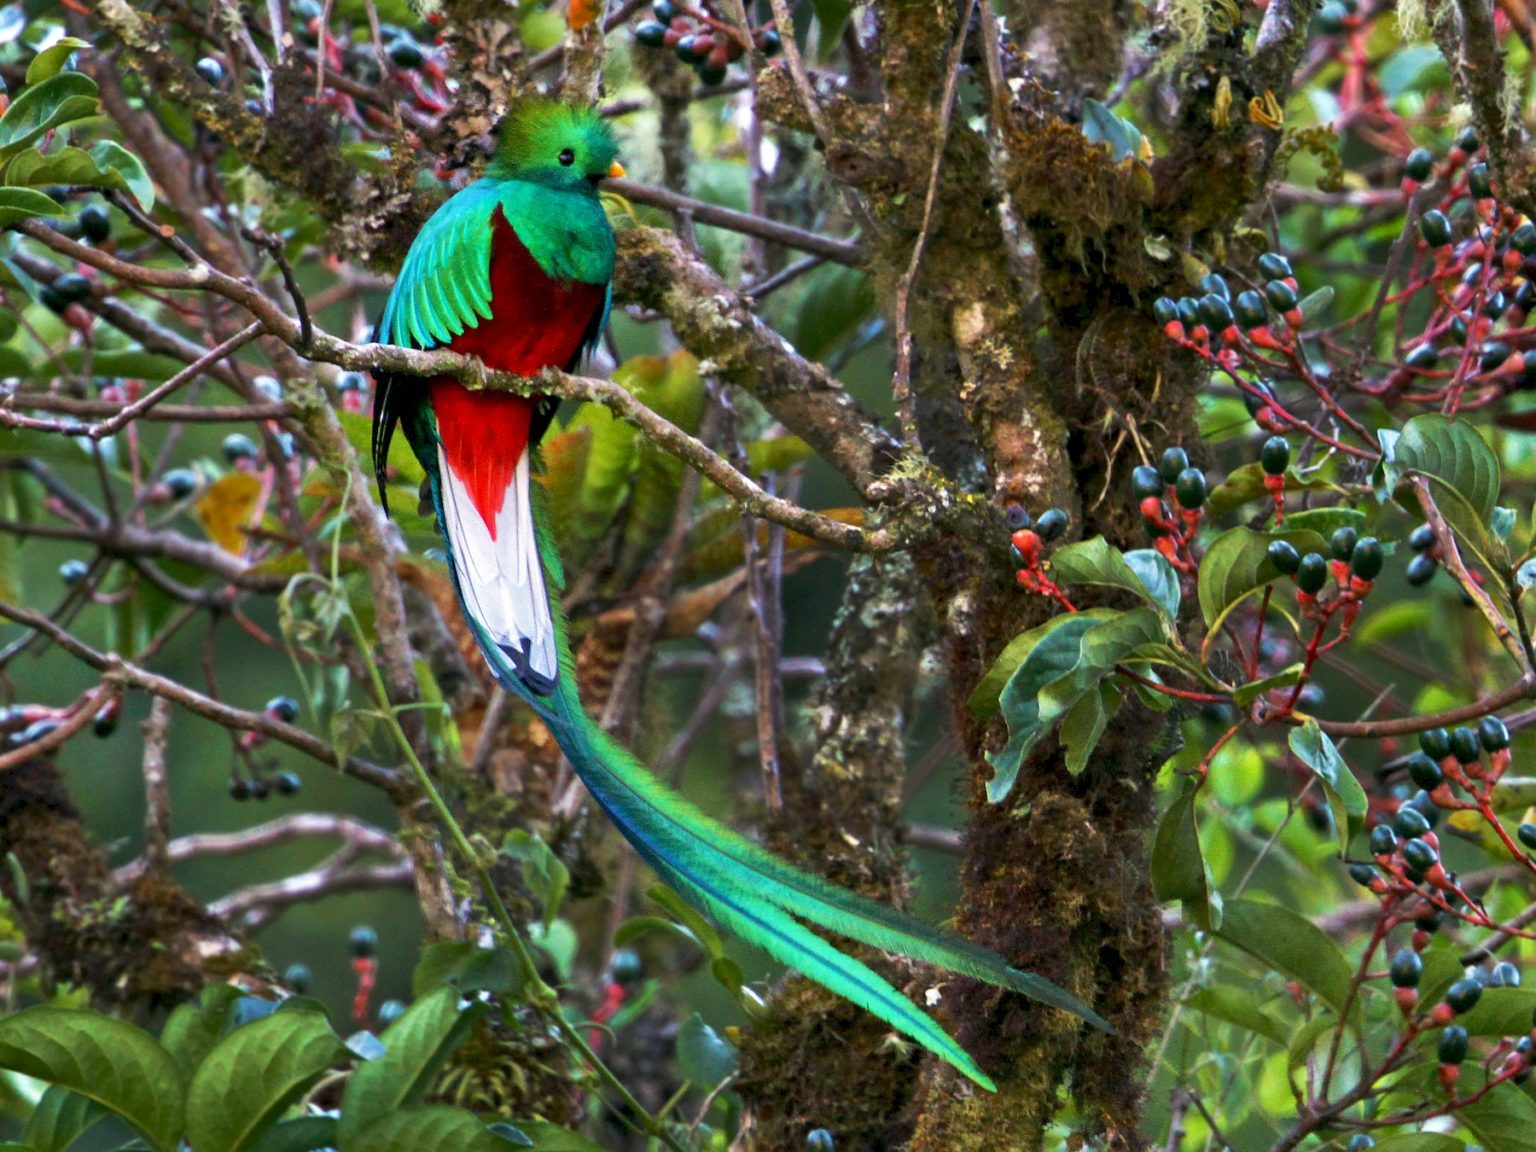 Quetzal du Mexique